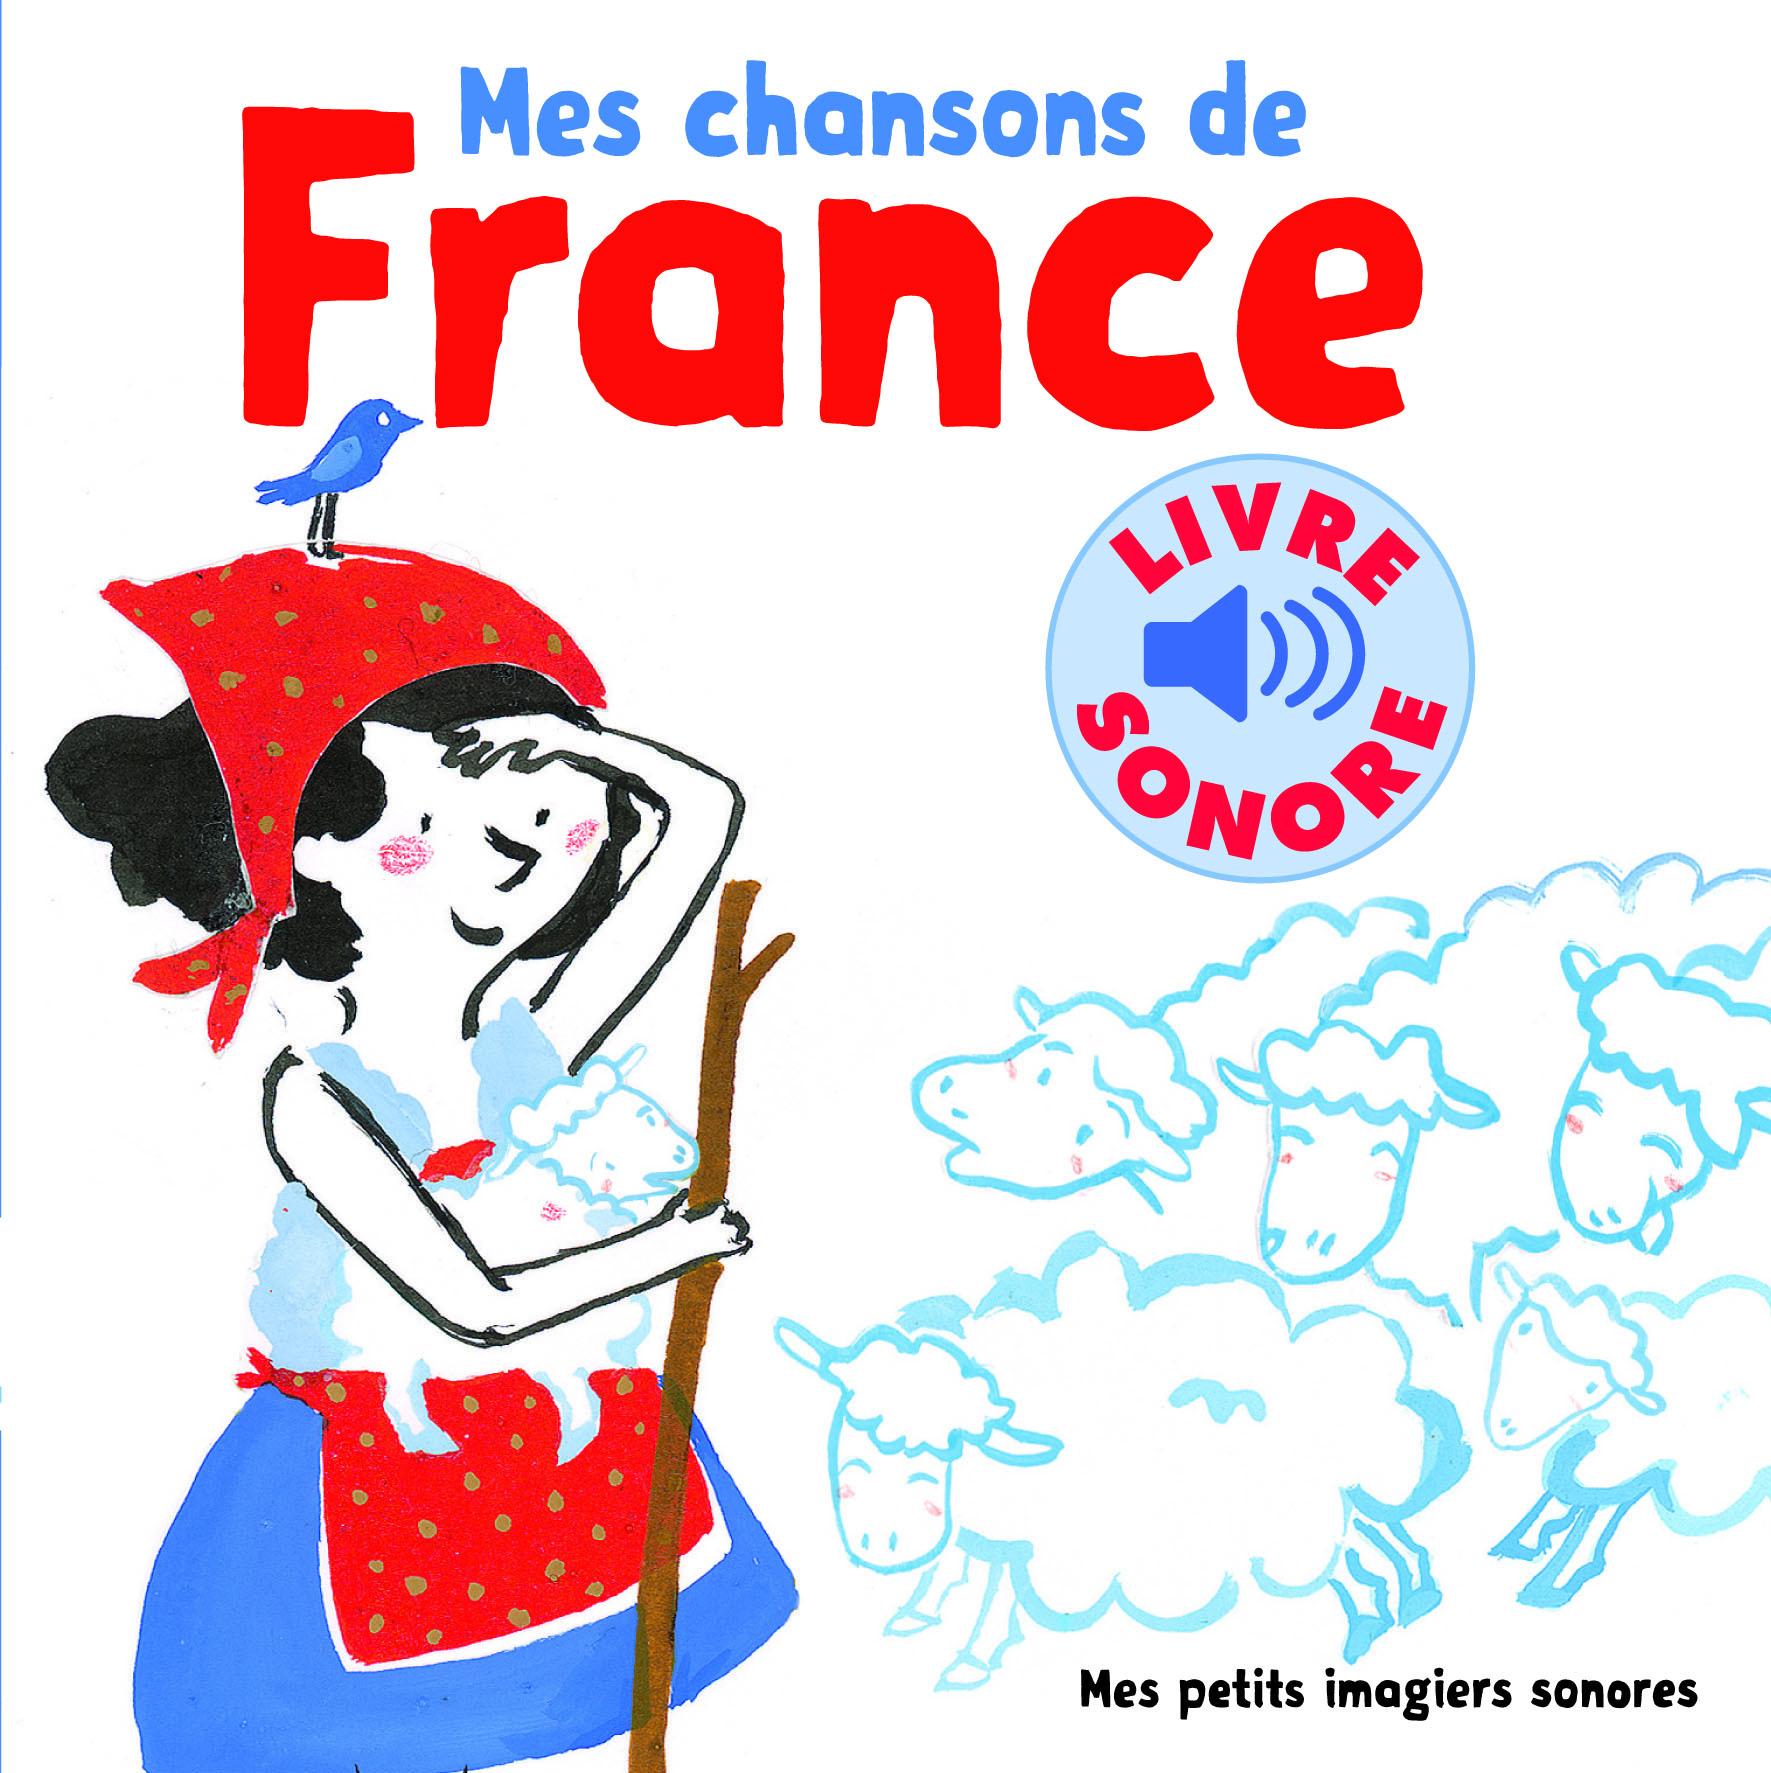 MES CHANSONS DE FRANCE VOL.1